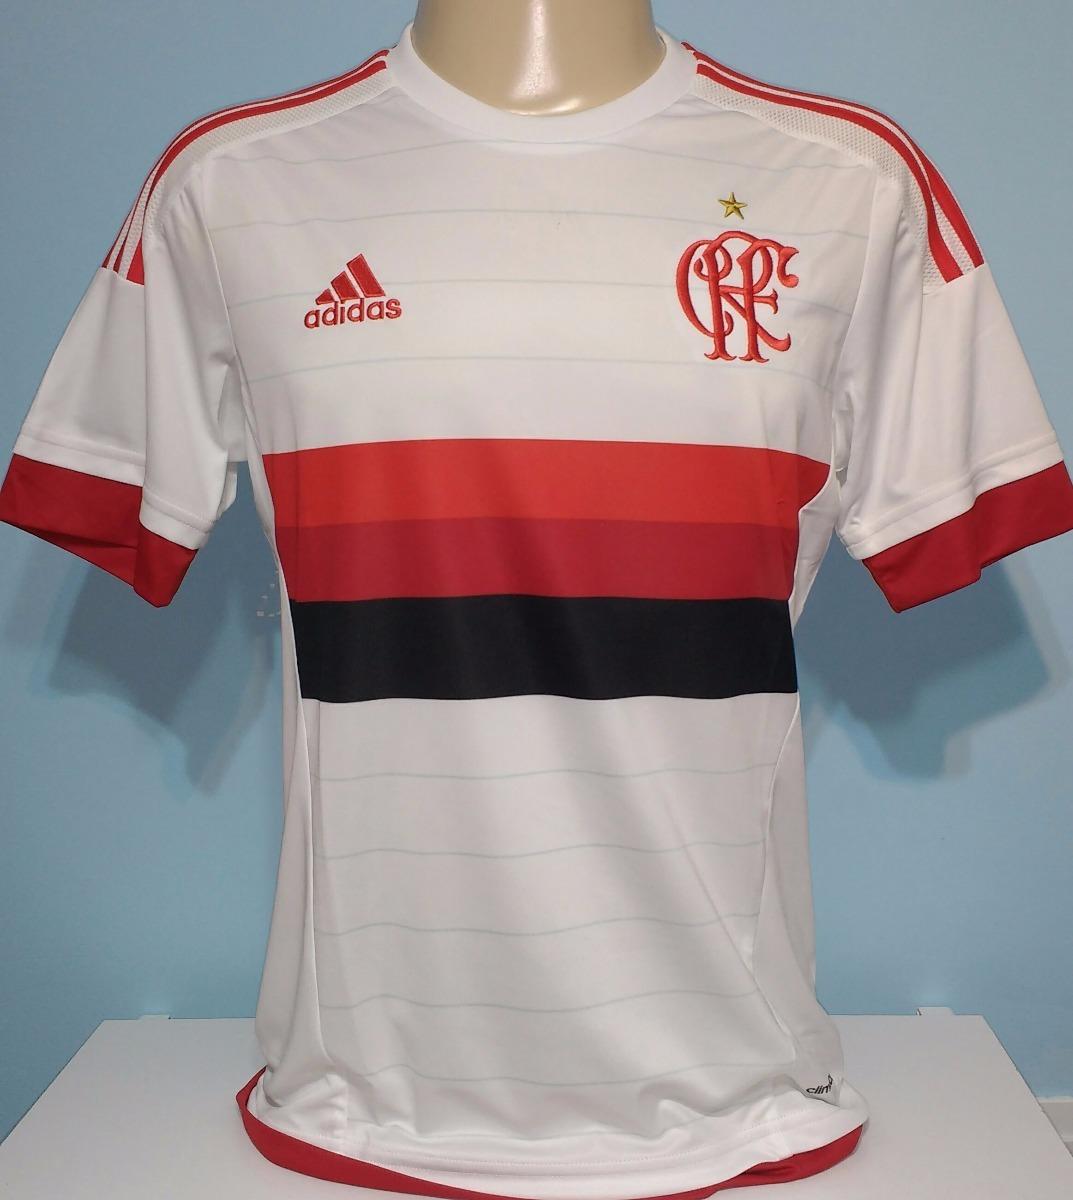 efd35d80f9518 camisa flamengo 2016 branca original adidas - 20. Carregando zoom.